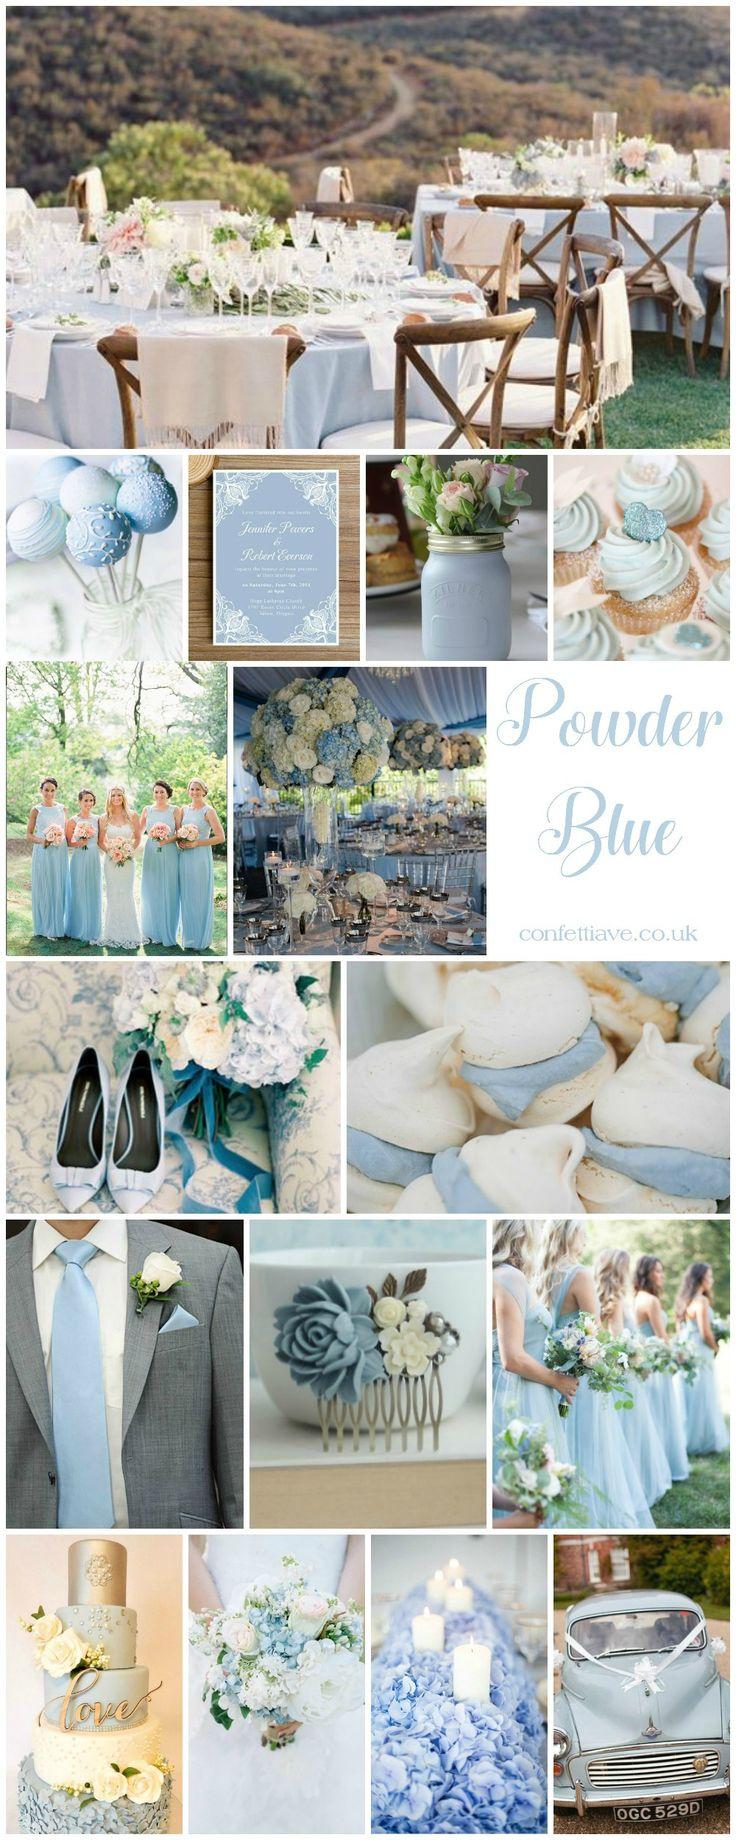 Powder Blue Wedding | Mood Board http://confettiave.co.uk/powder-blue-wedding http://hotdietpills.com/cat3/diet-pills-phenq-vs-phen375-ingredients.html